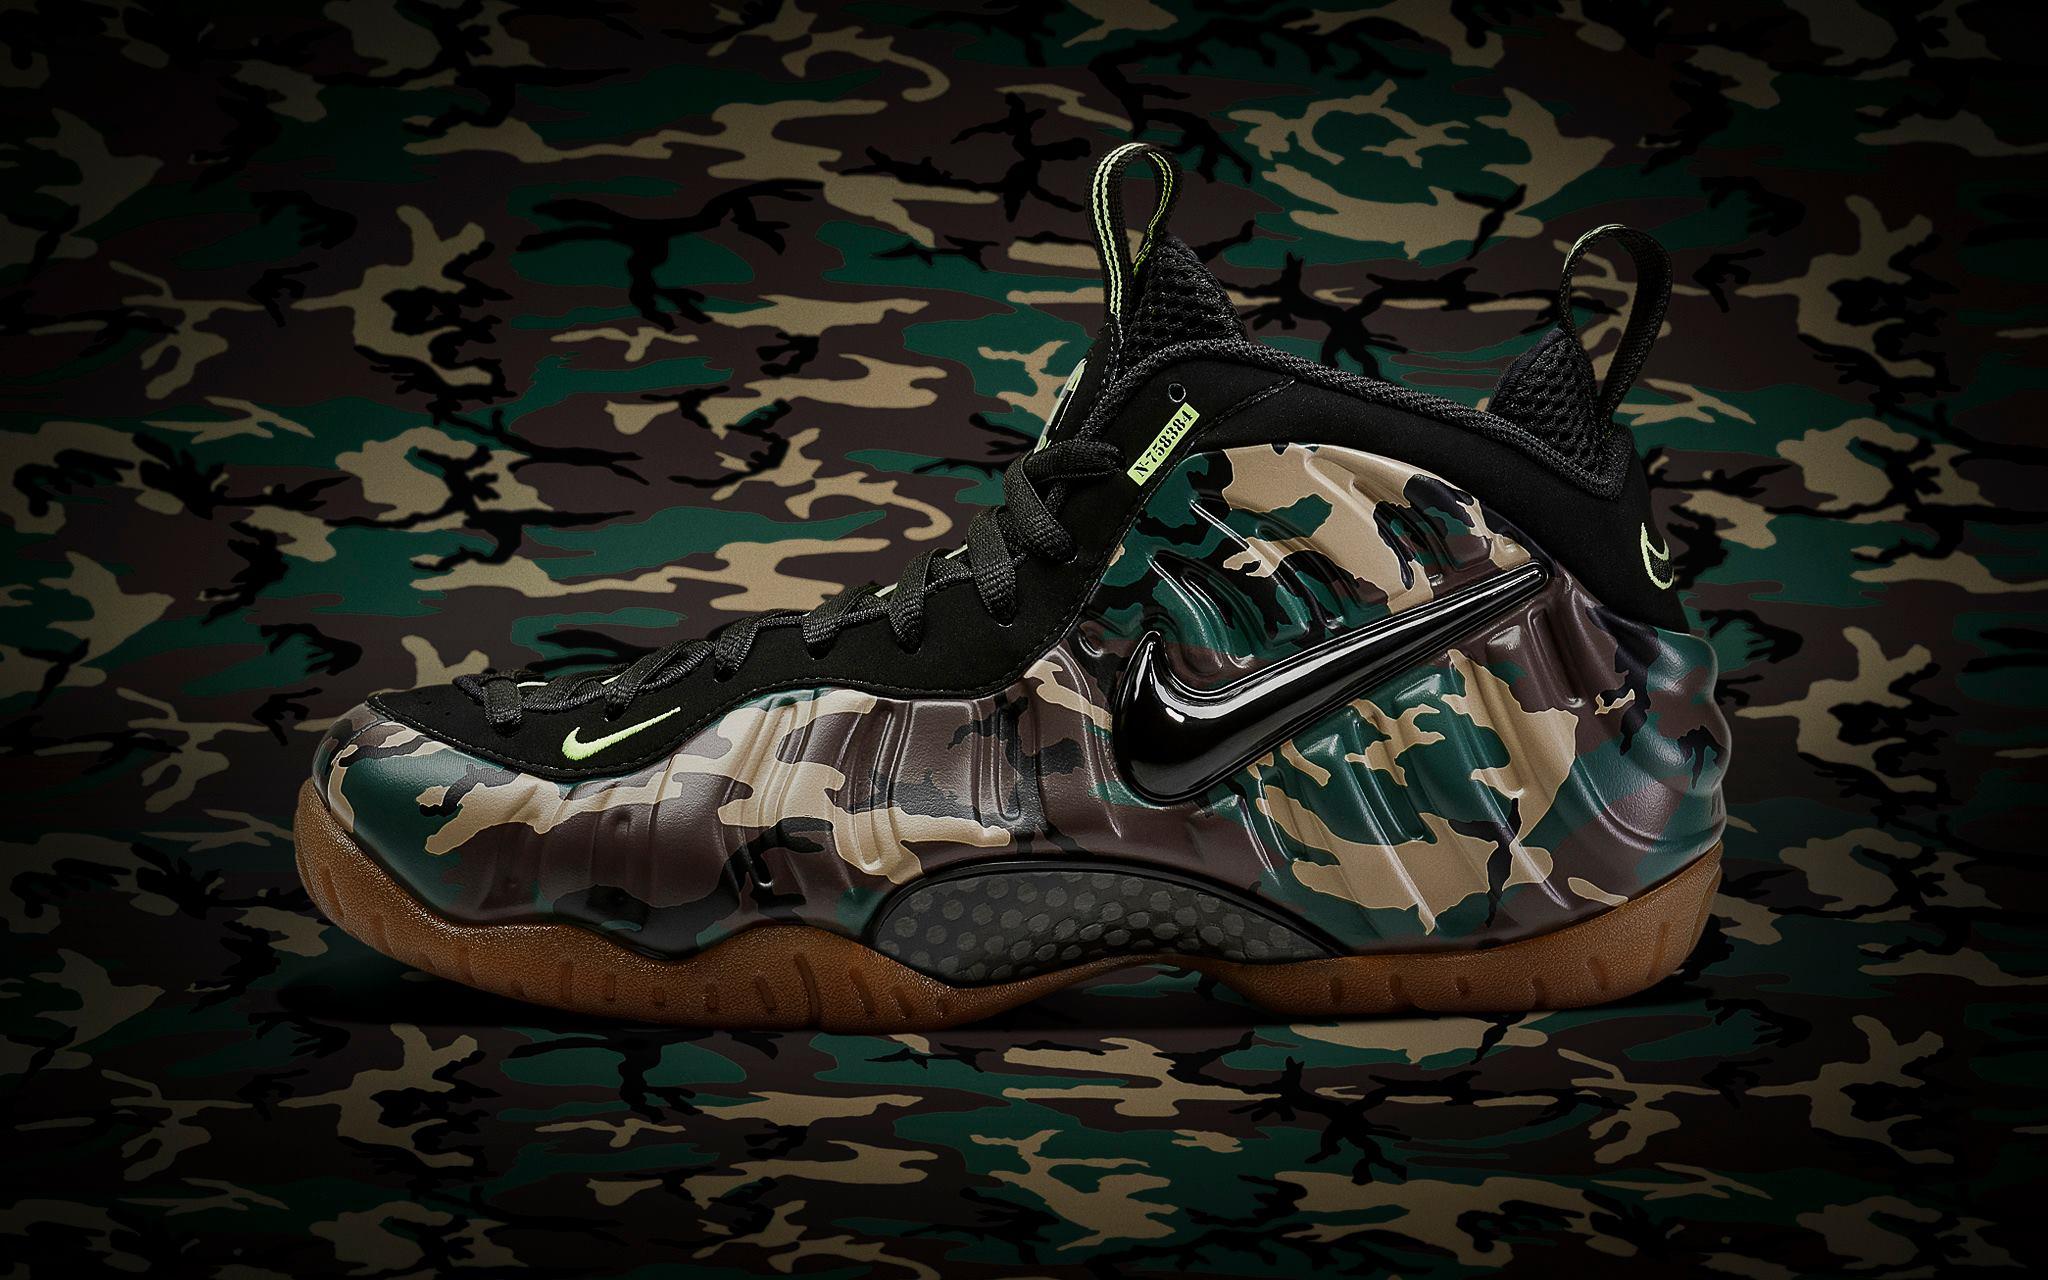 52571a0c14ba9 Kicks: Nike Air Foamposite Pro Army Camo — Acclaim Magazine